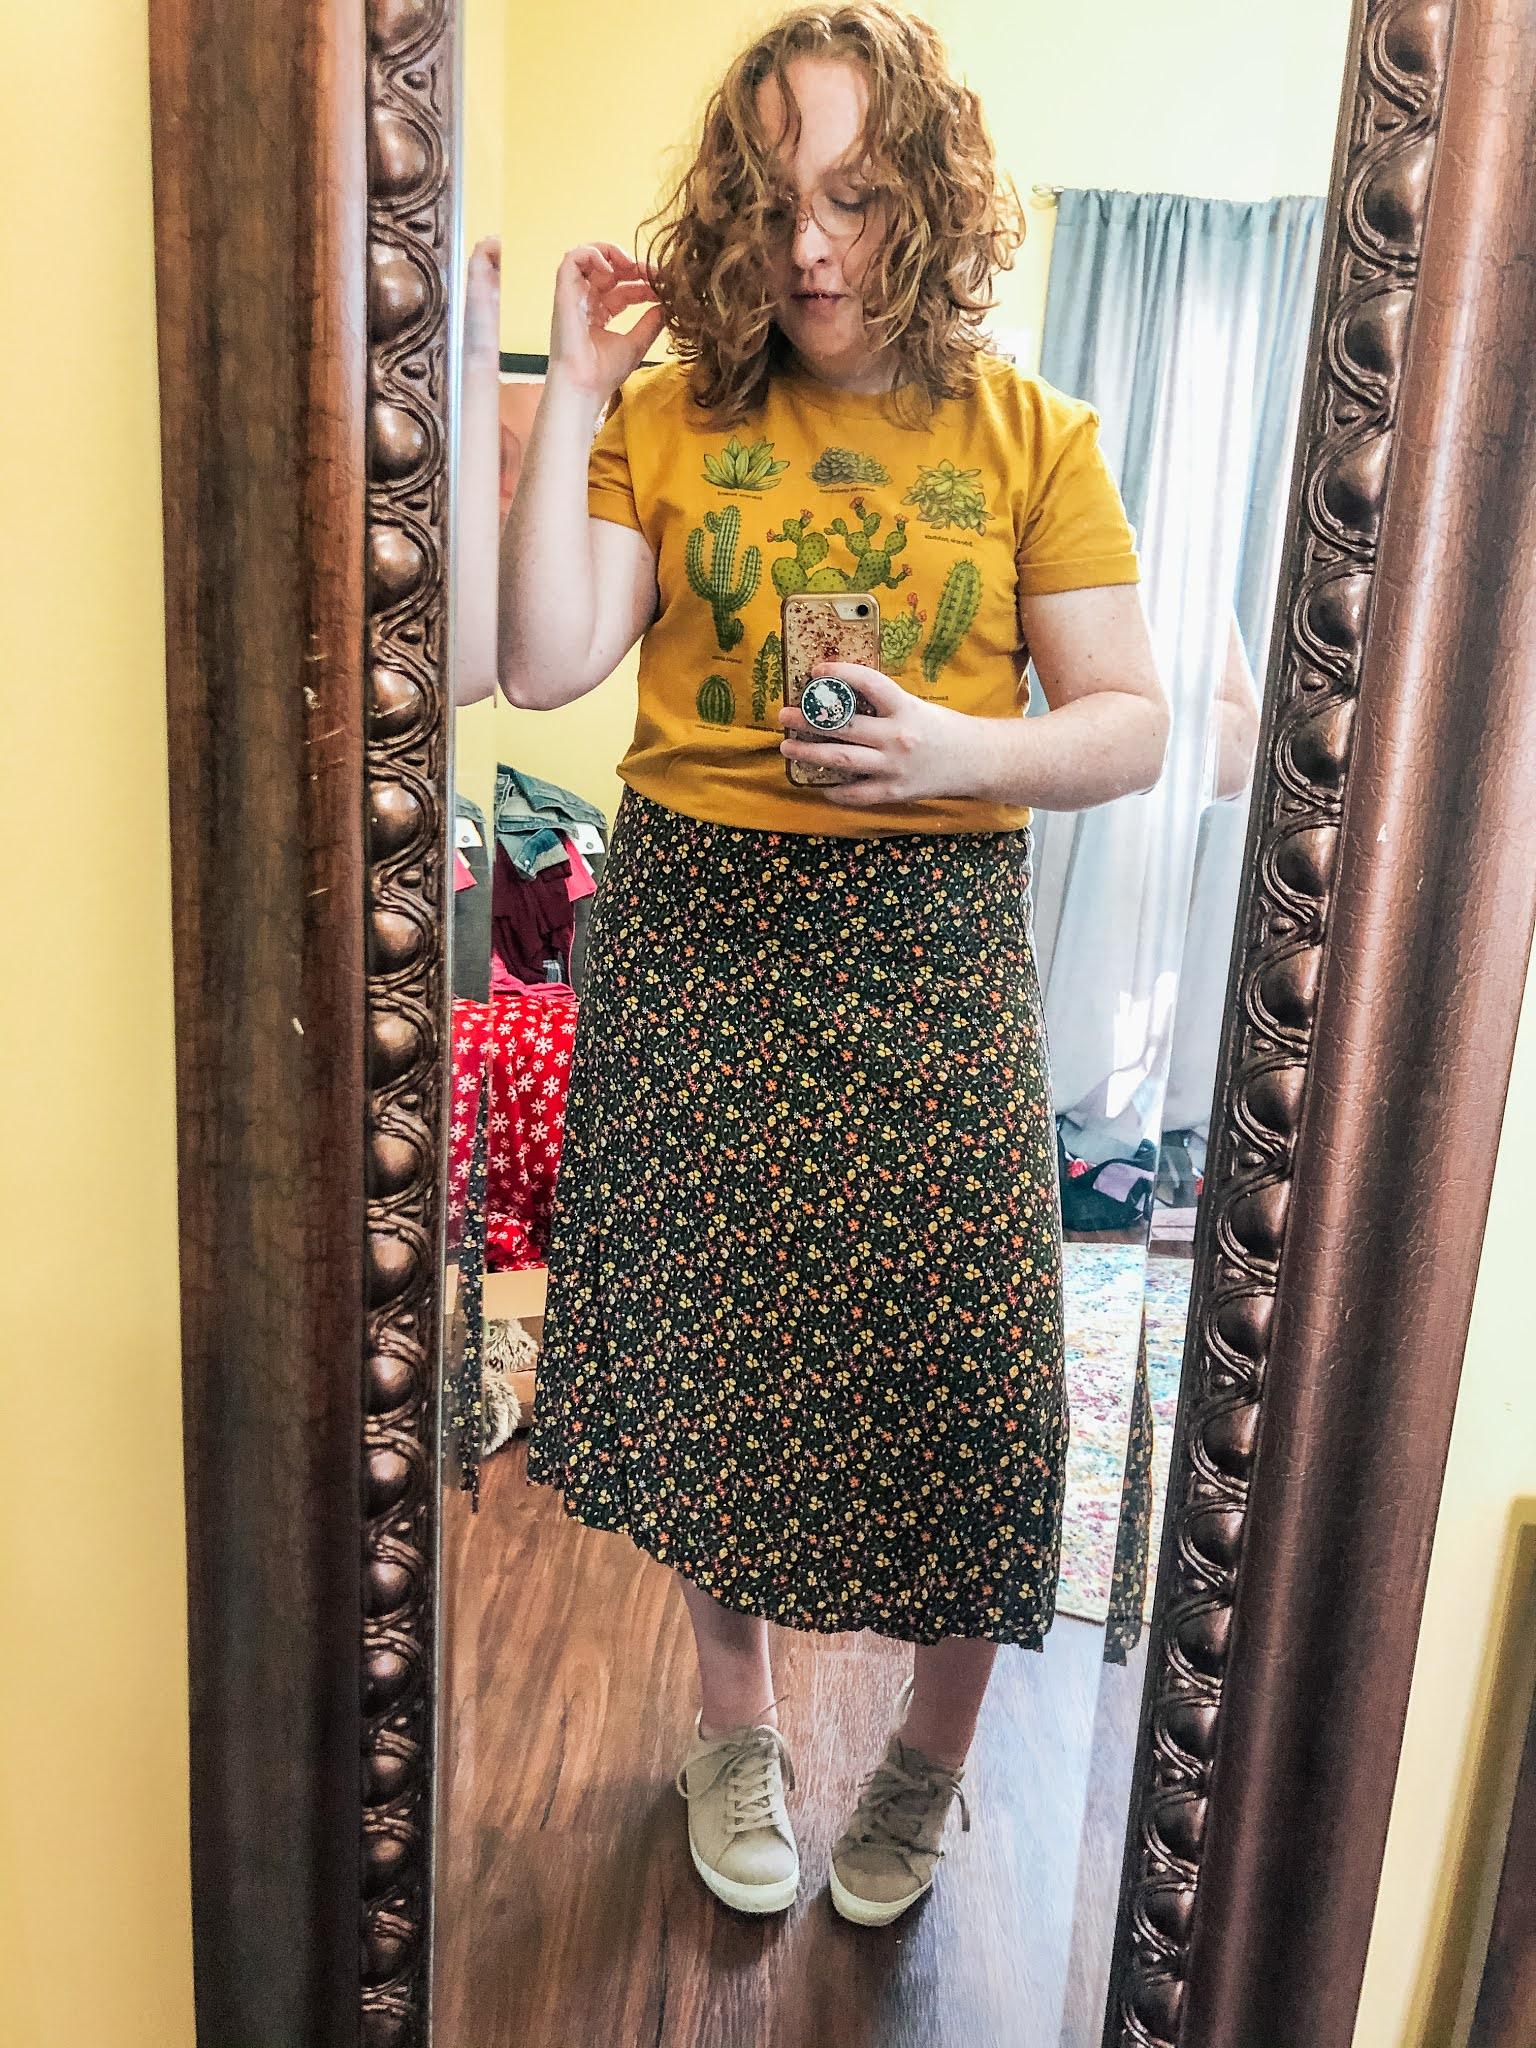 cactus-shirt-floral-midi-skirt-taupe-sneakers